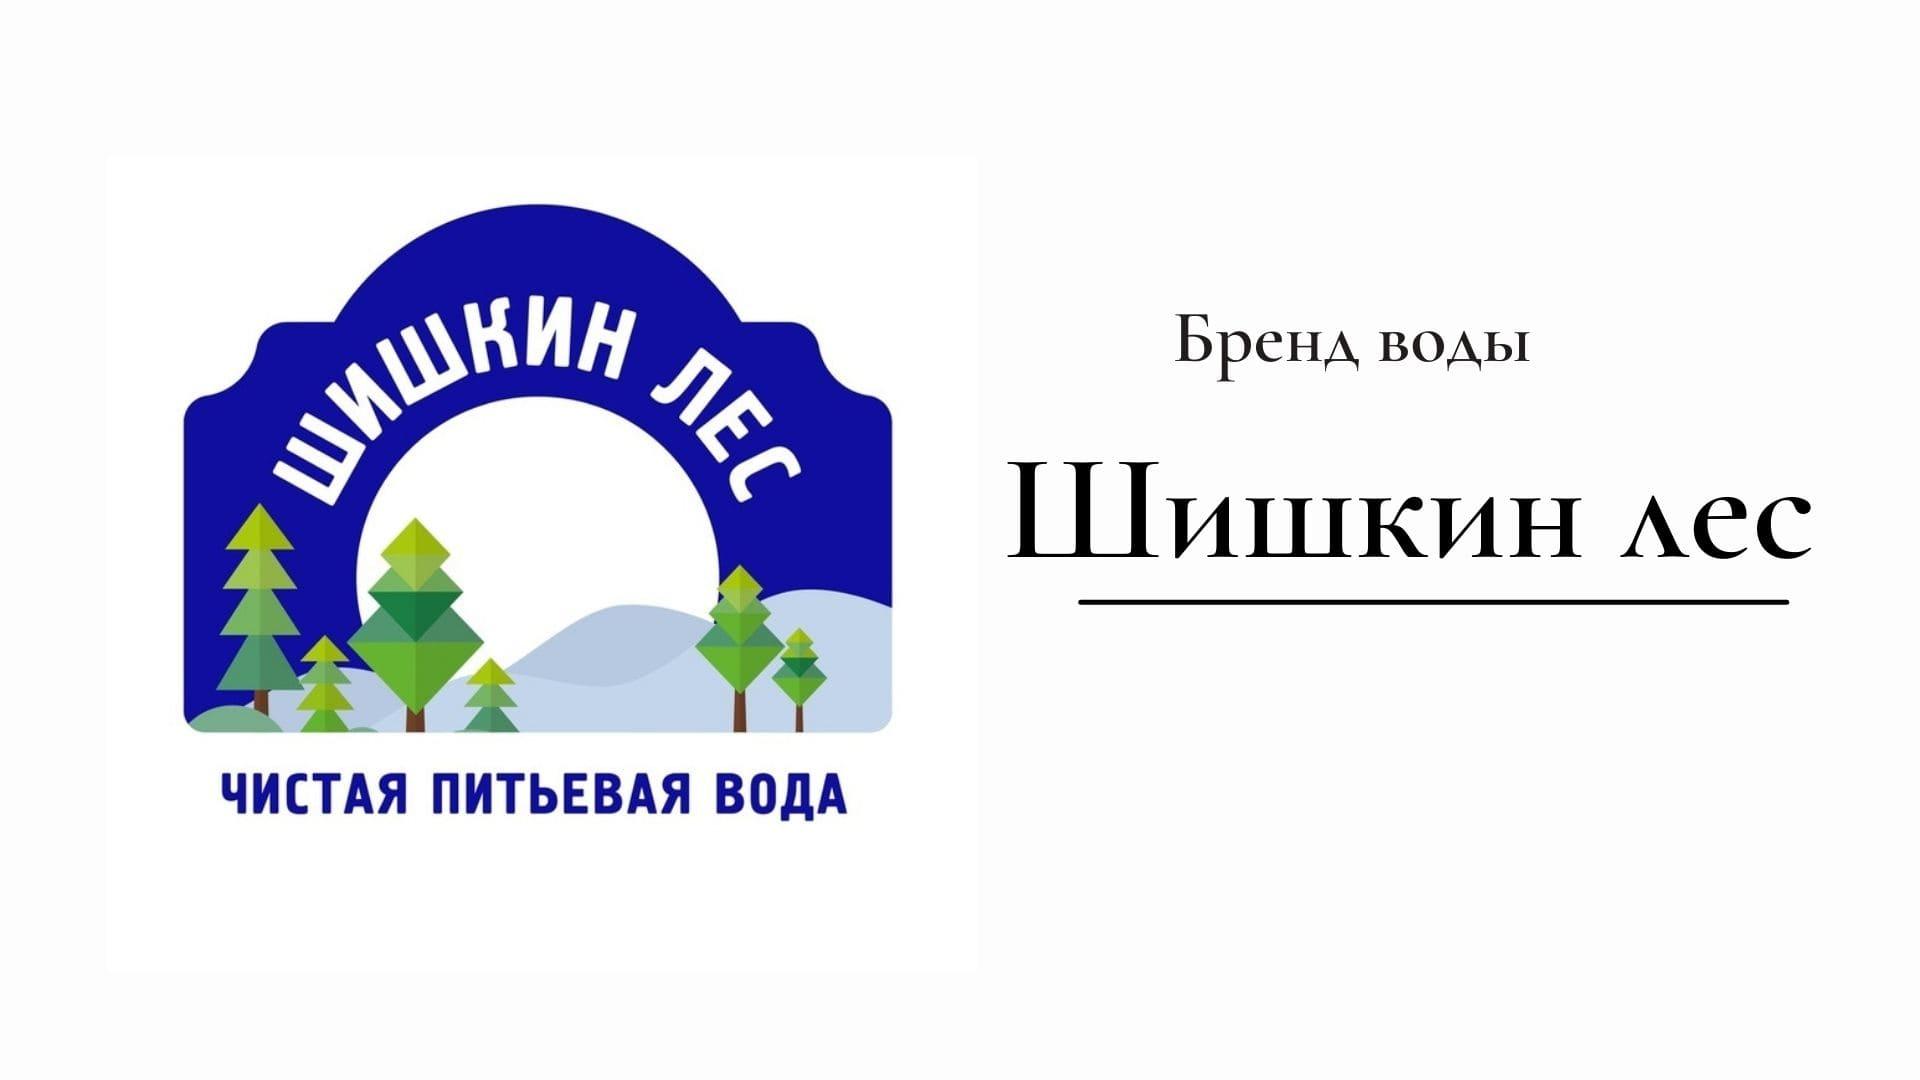 Бренд Шишкин лес